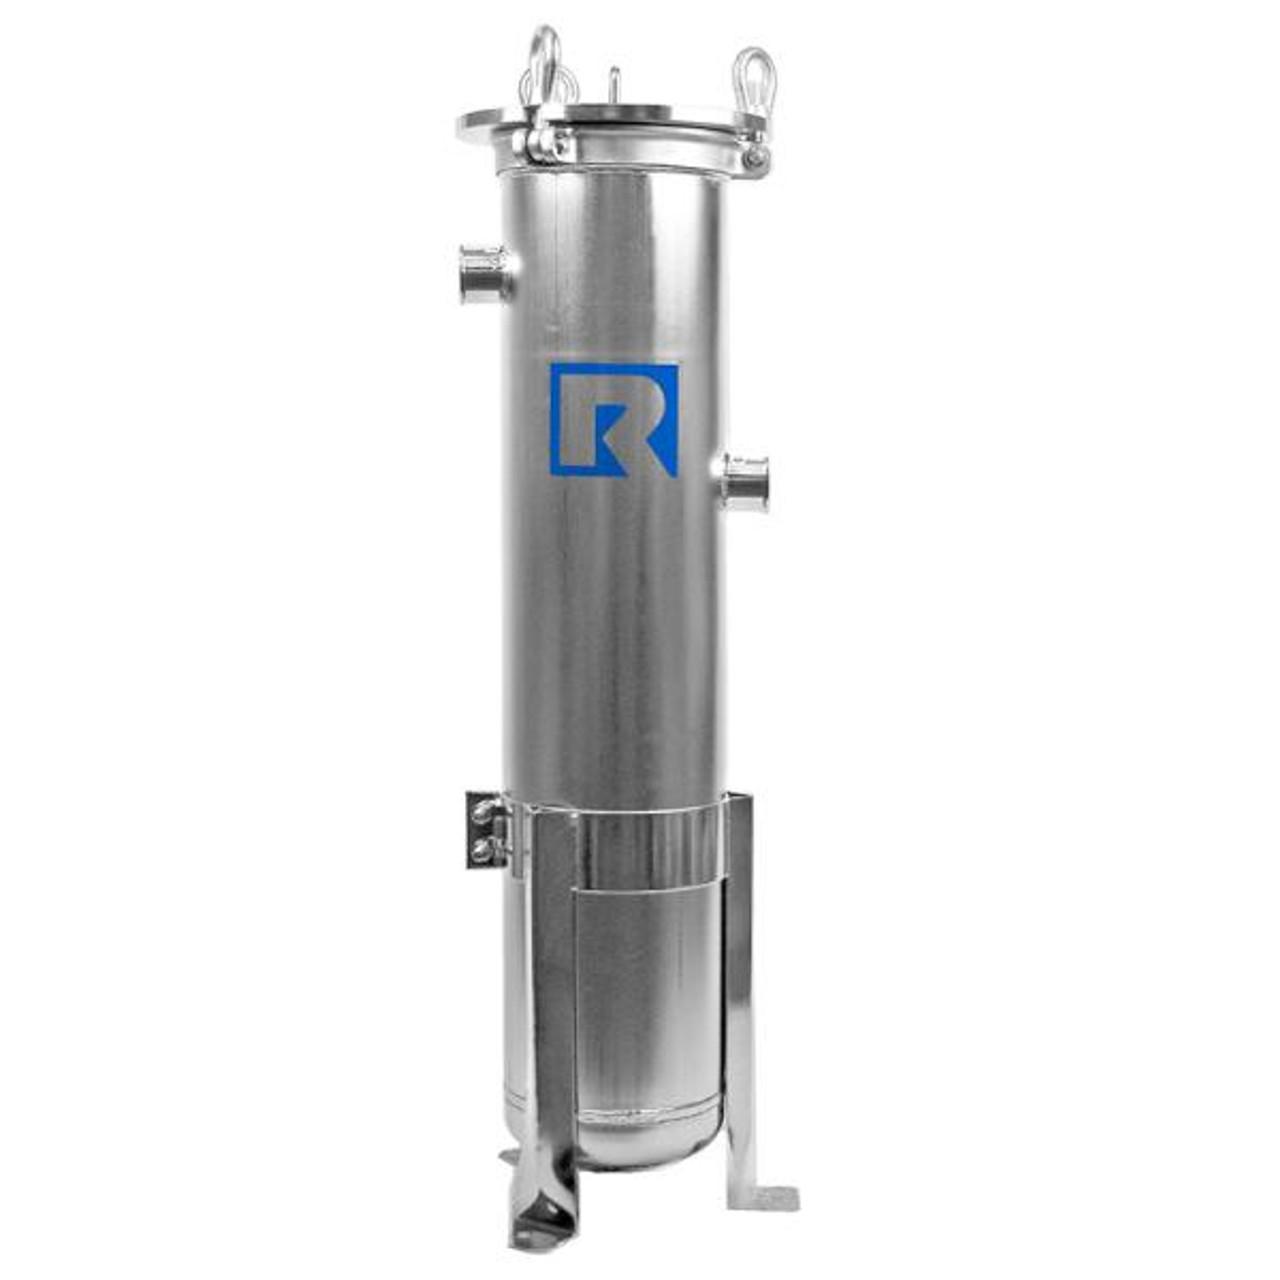 NCO Brewing & Beverage Filter